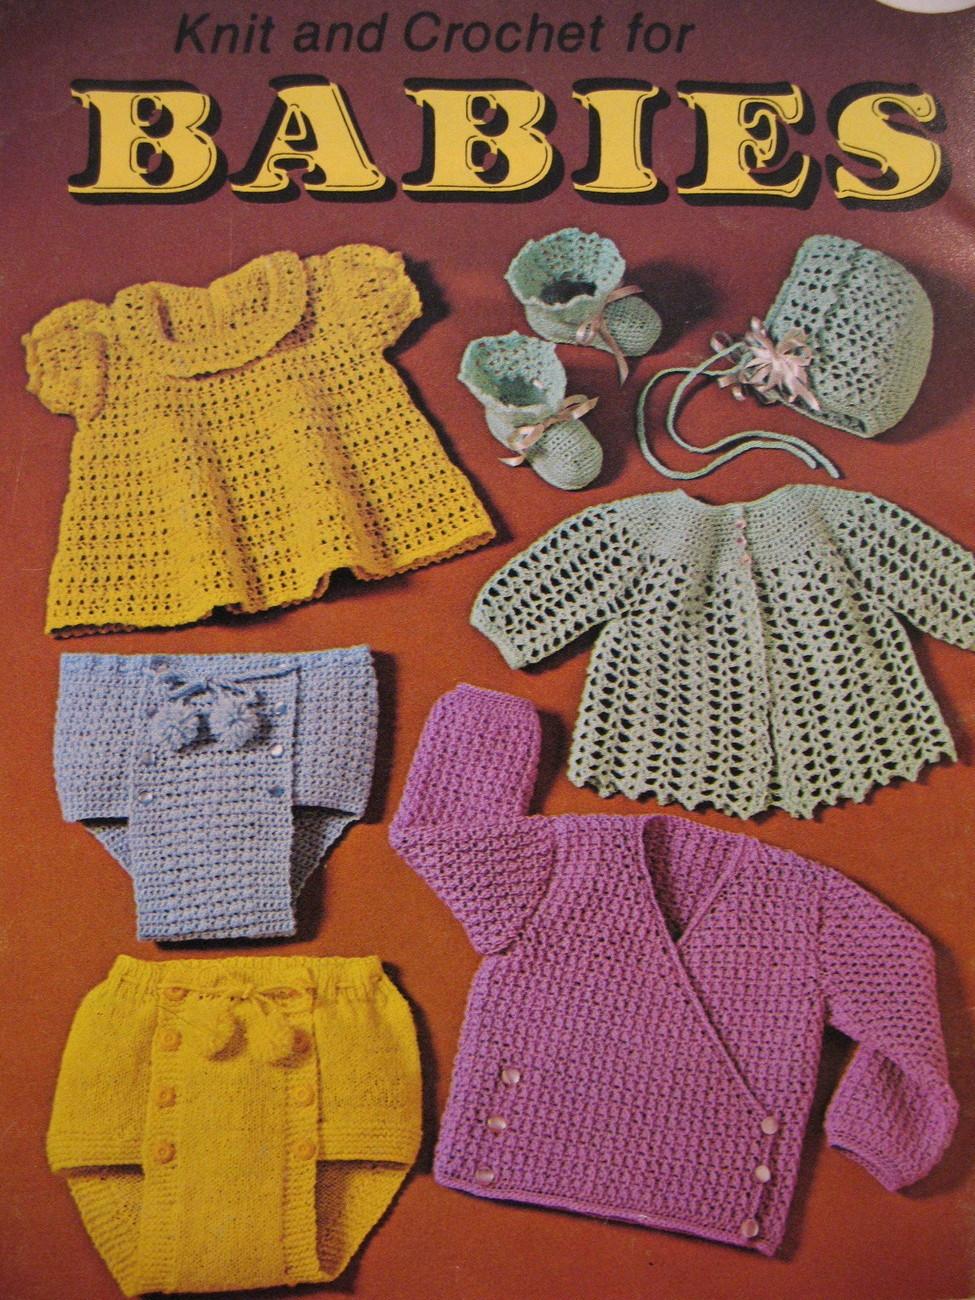 Sailor Outfit Dress Knitting Crochet Pattern Booklet Babies